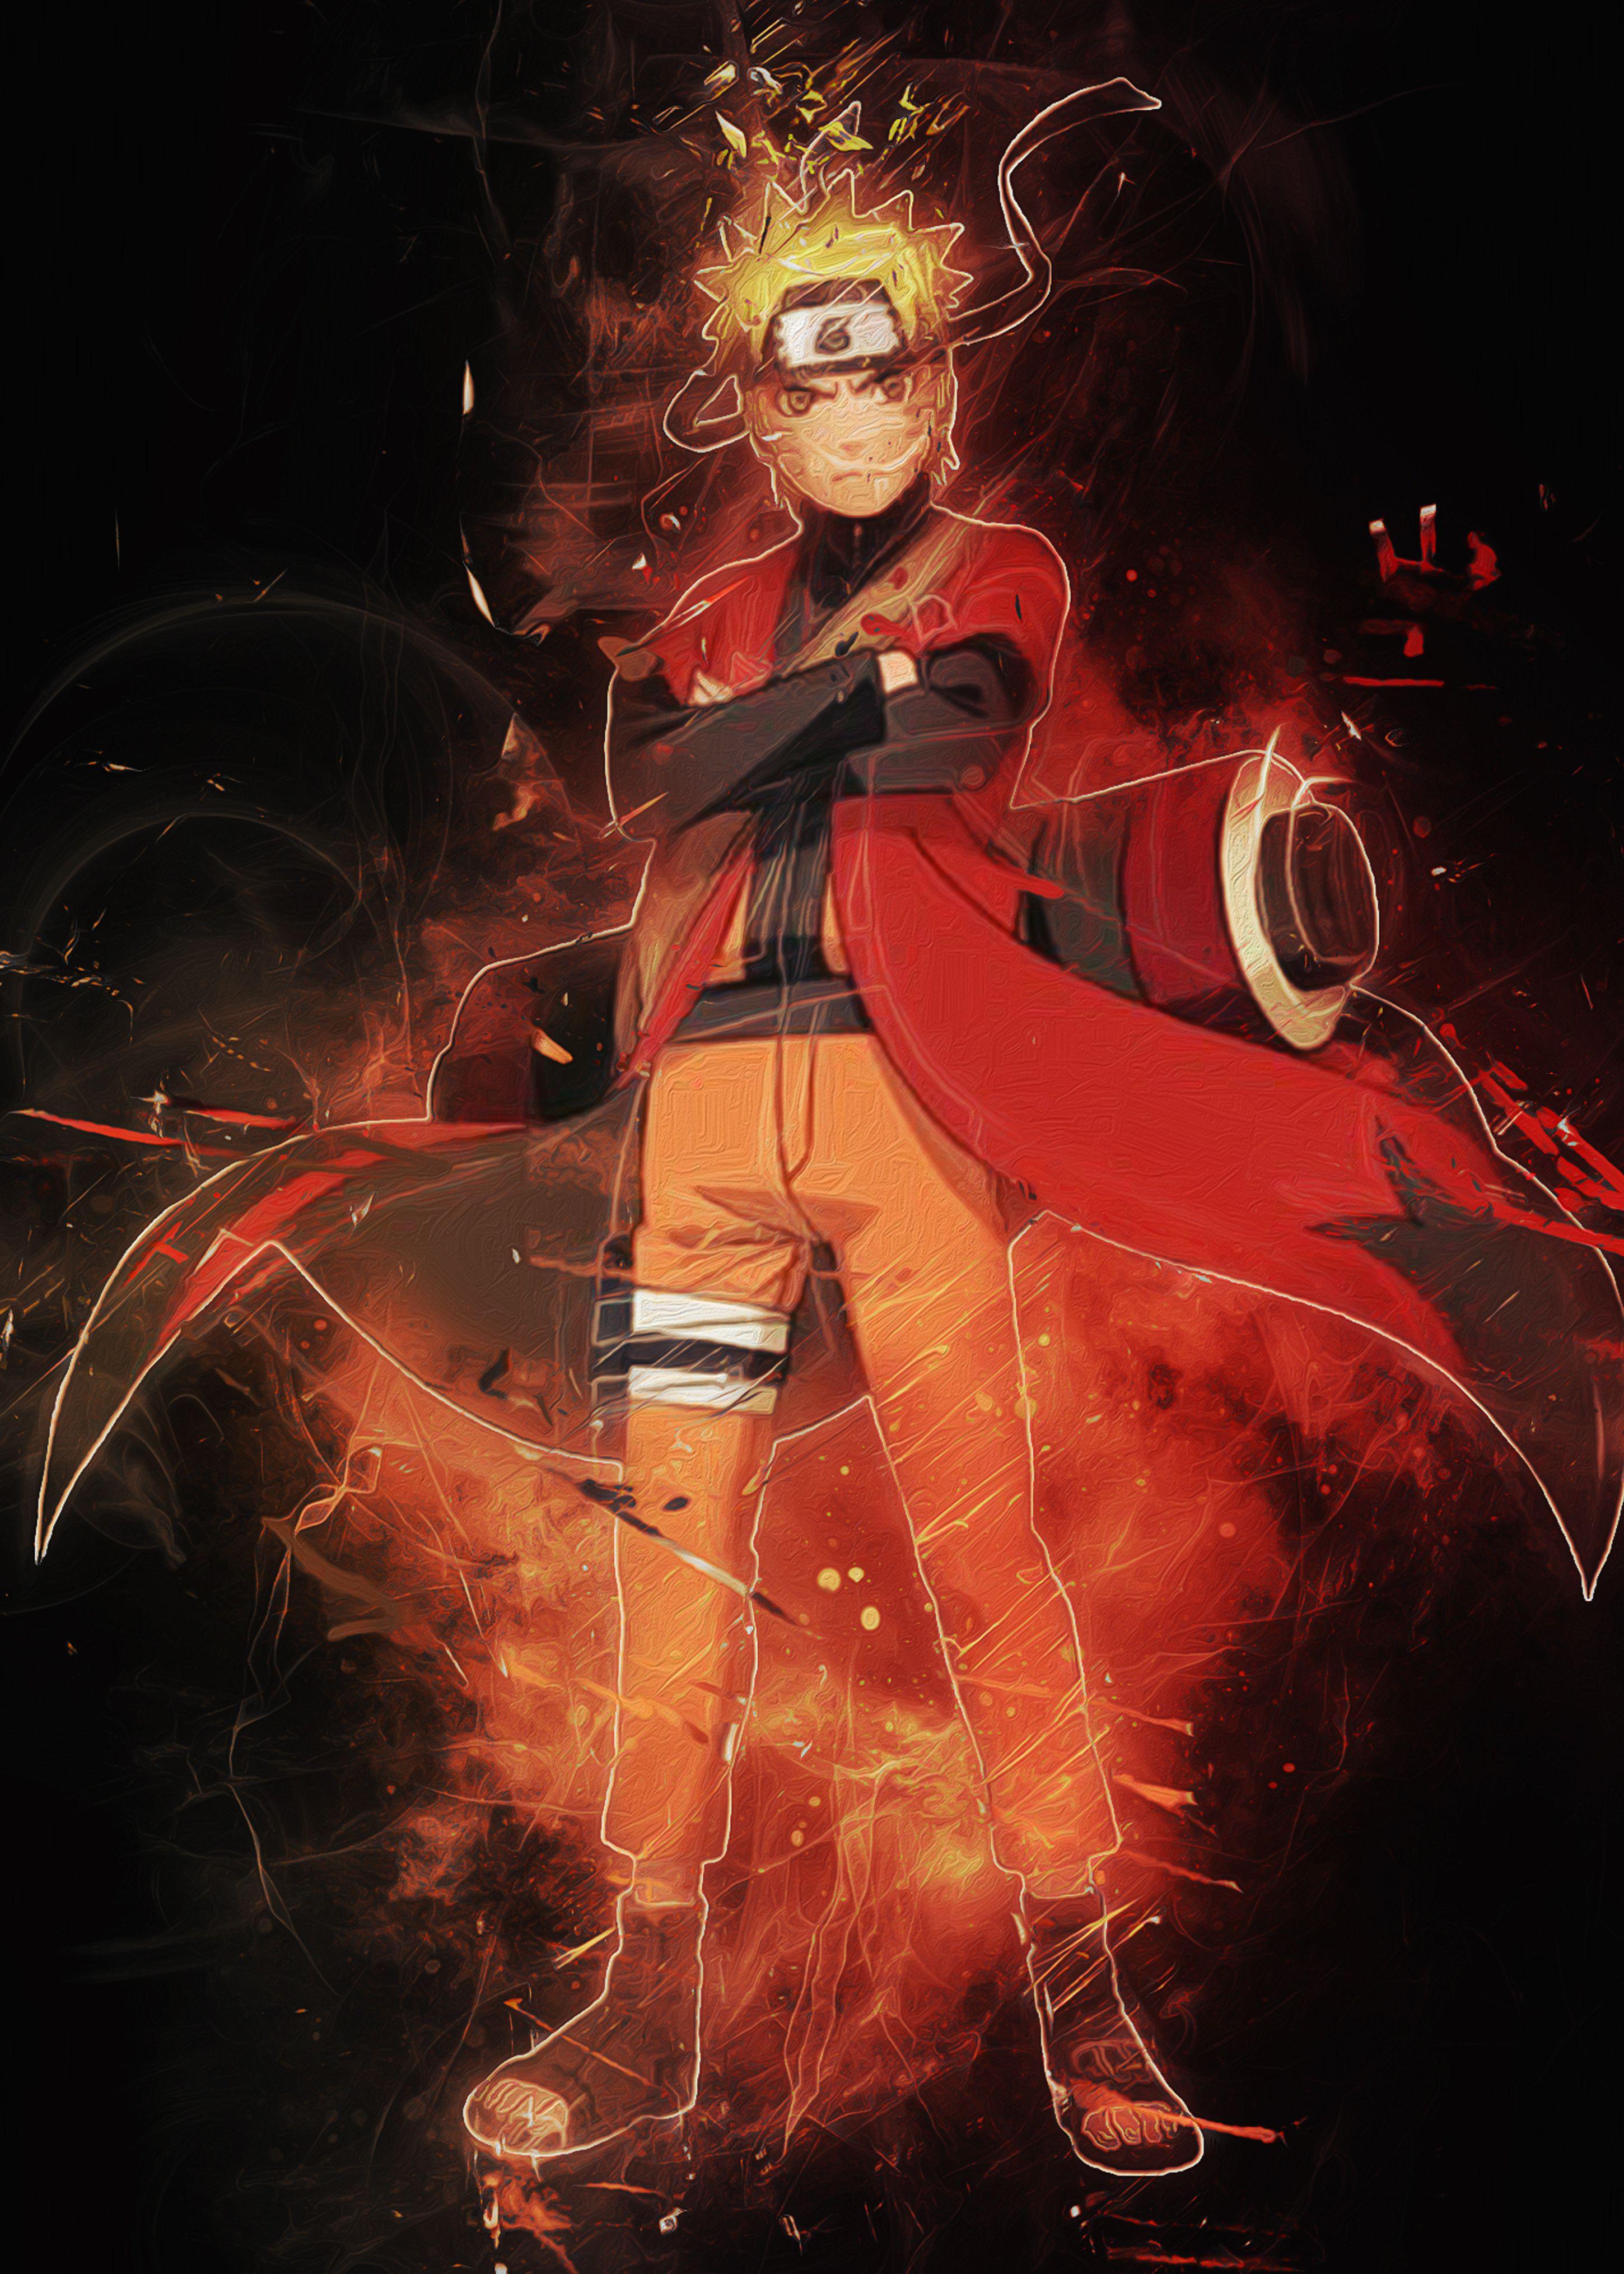 Naruto Coolbits Artworks Print Naruto Cool Best Naruto Wallpapers Naruto Uzumaki Art